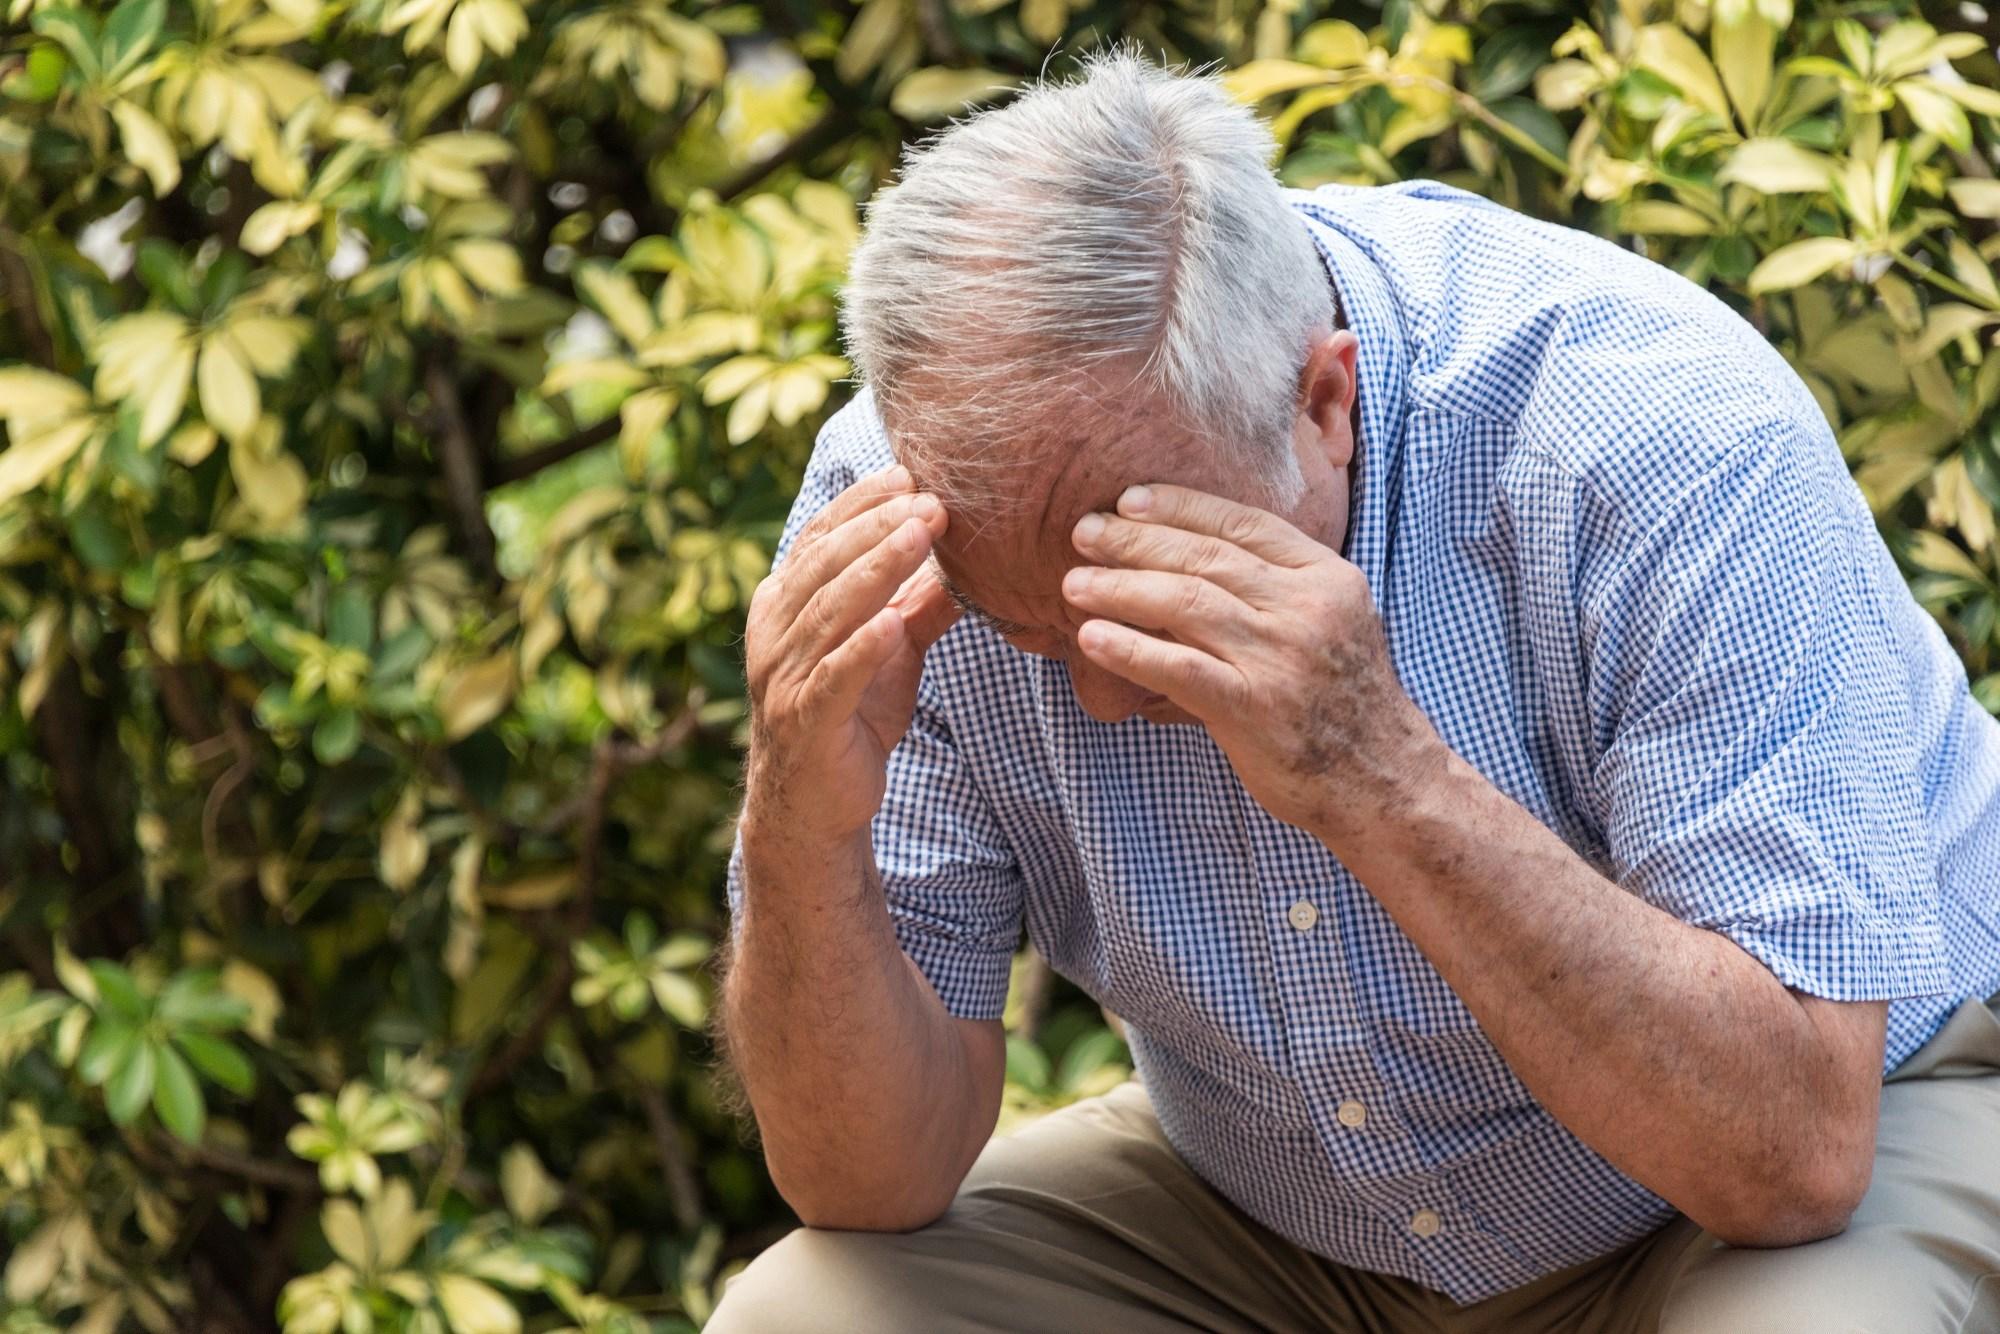 Locally Asymptomatic Ischemic Stroke May Present as Migraine Aura